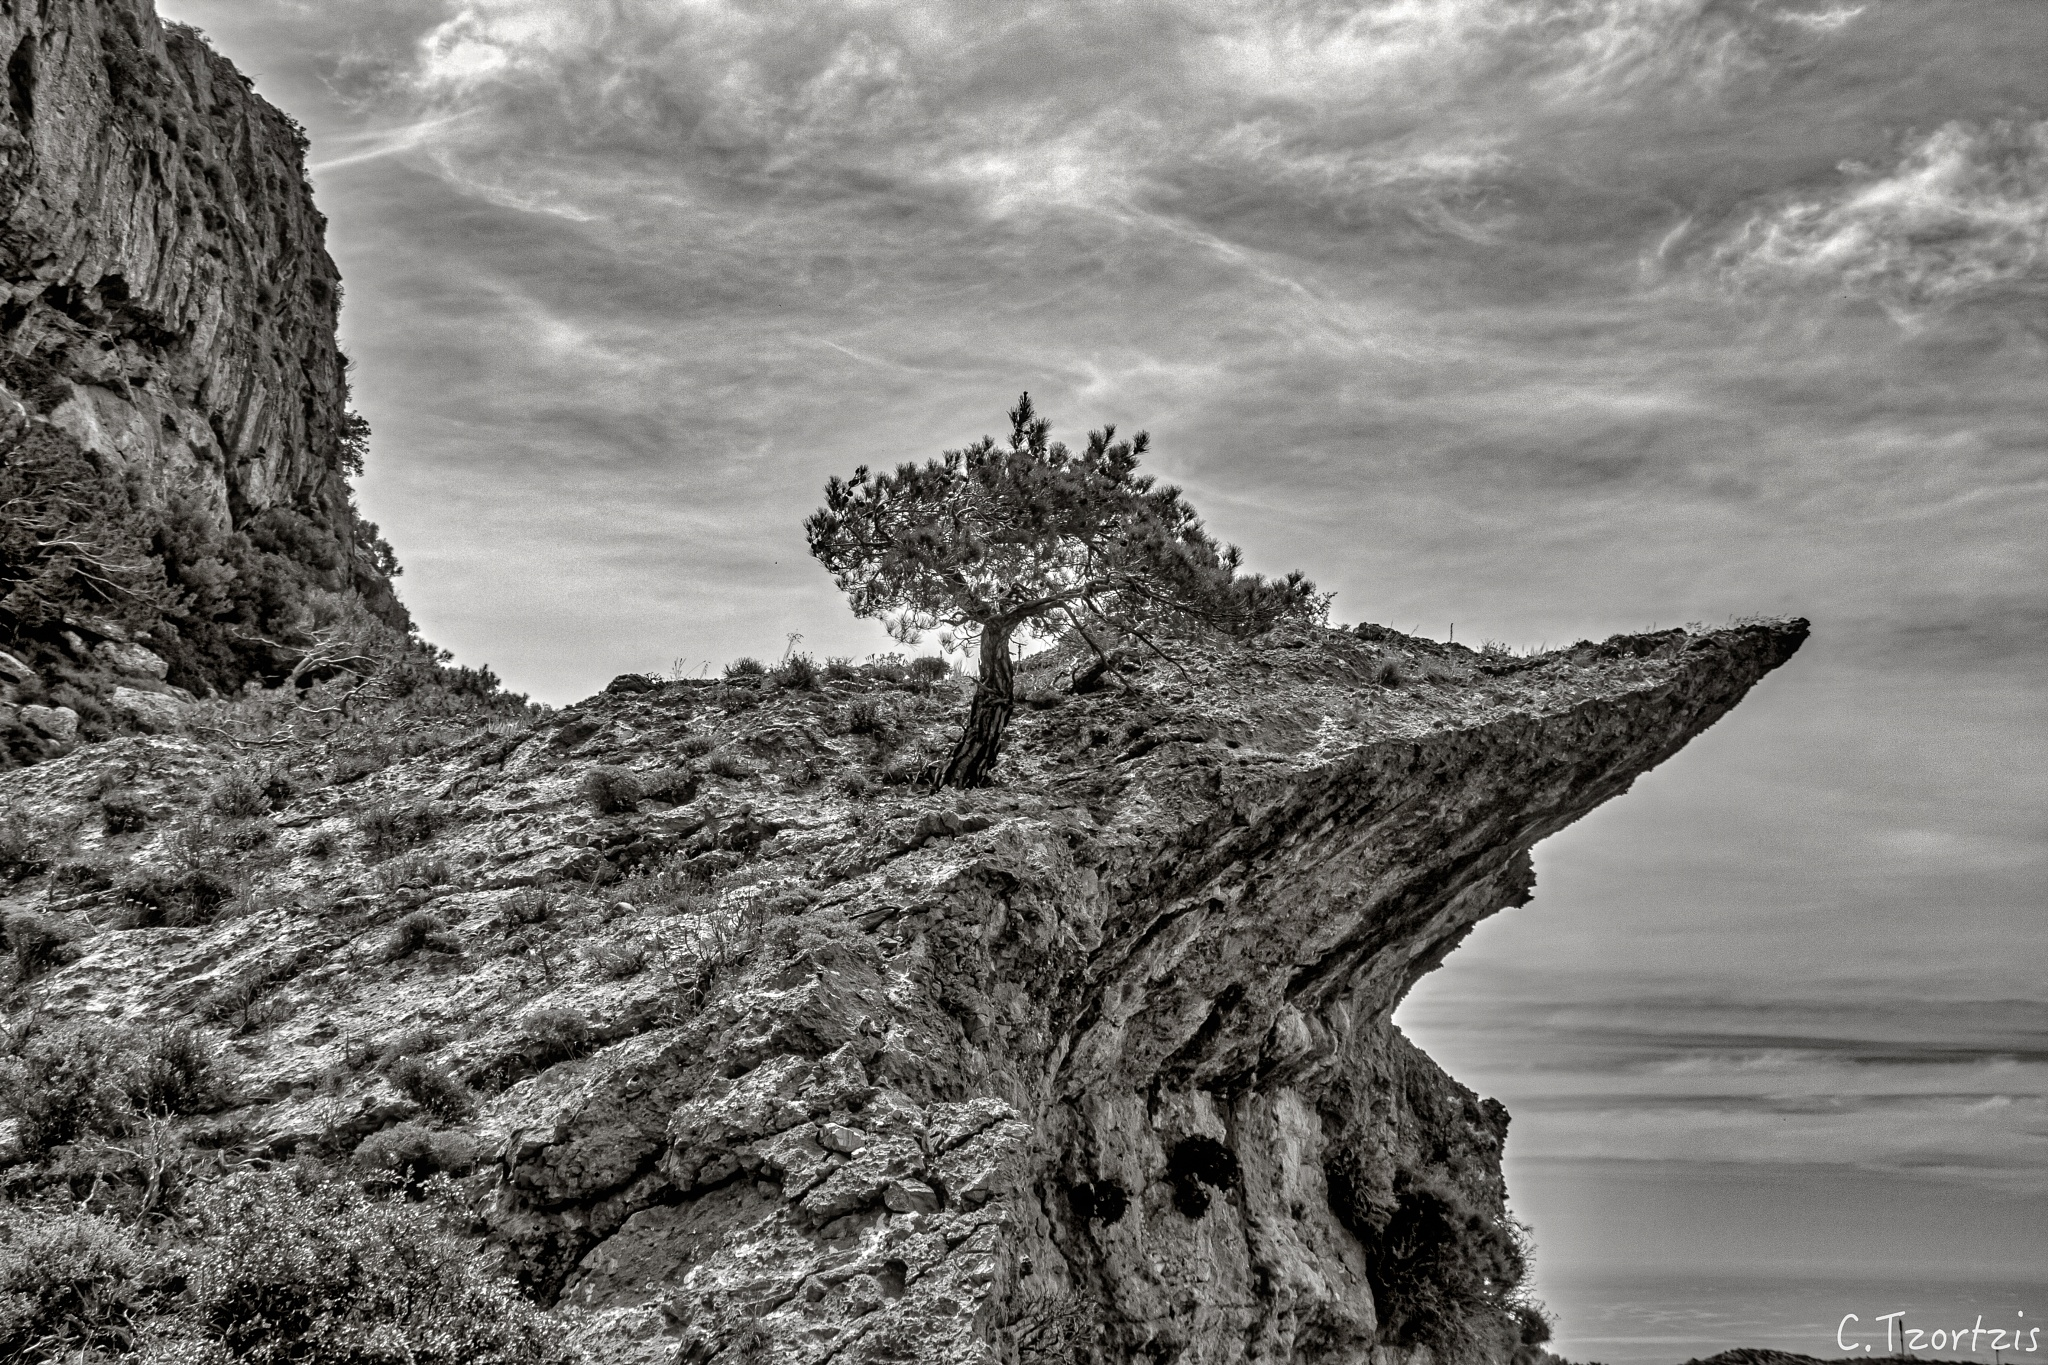 Untitled by Christos Tzortzis